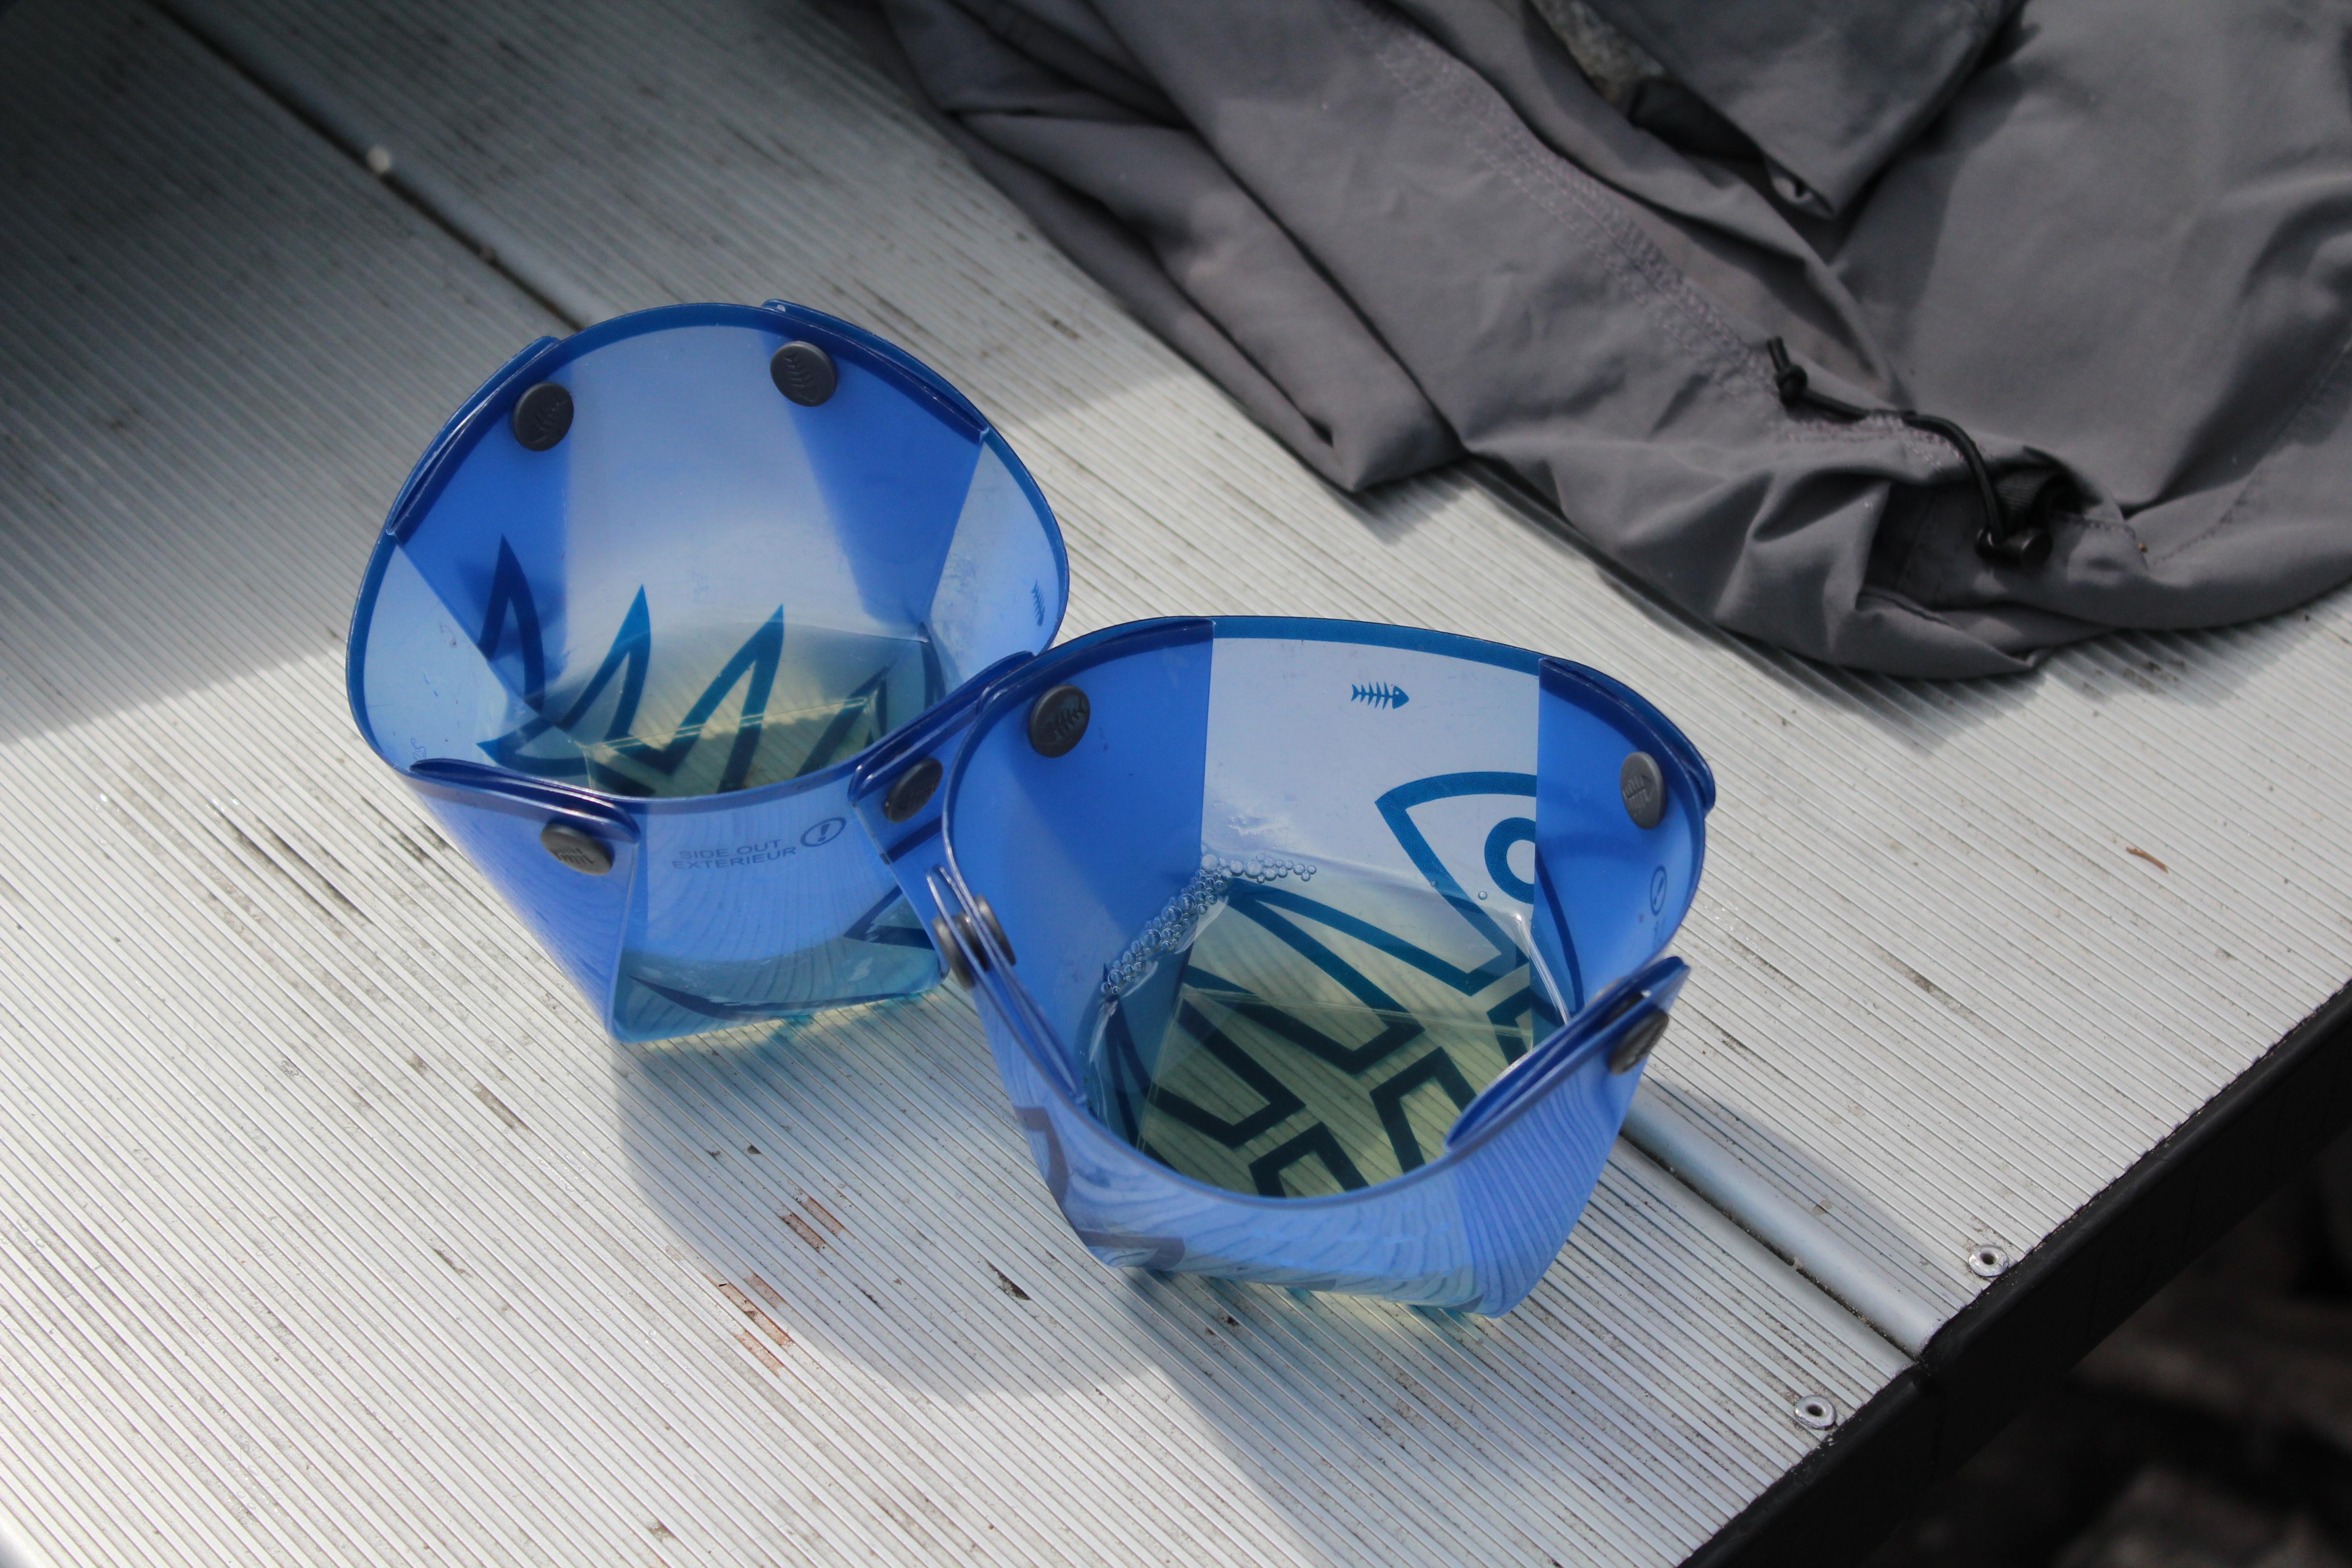 Fozzils Cups